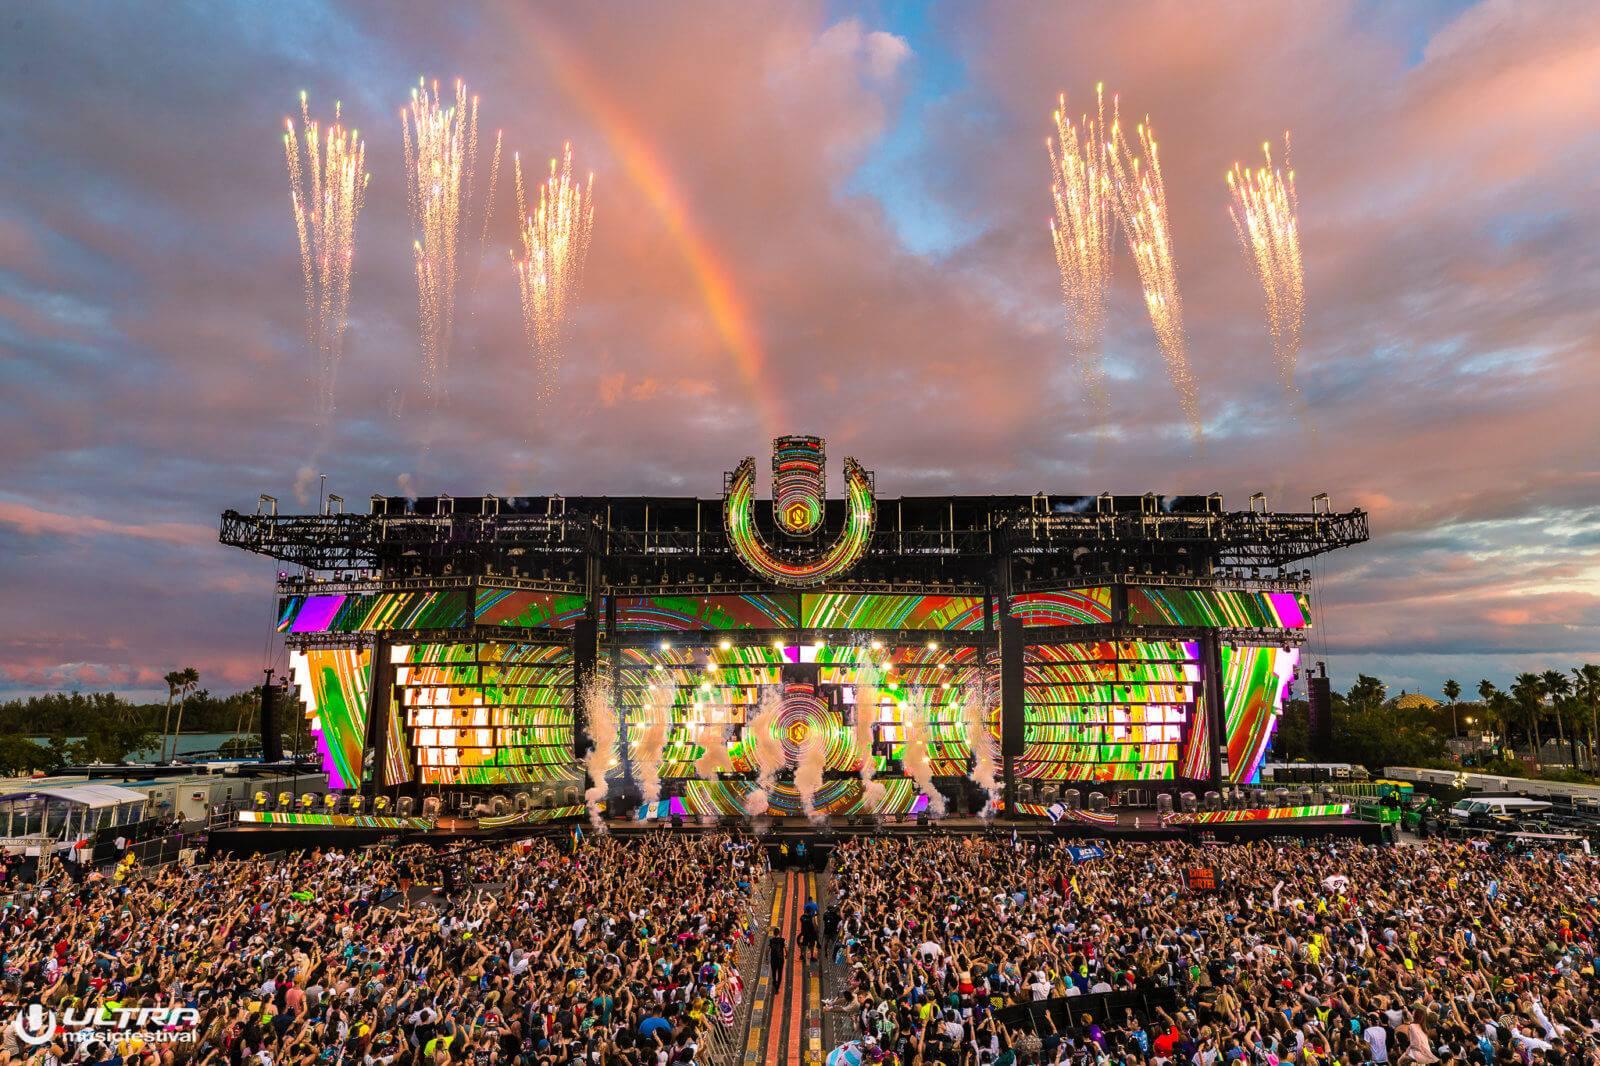 Road to Ultra Taiwan 2020 超世代音樂節!全球第一電音節11/14強勢回歸